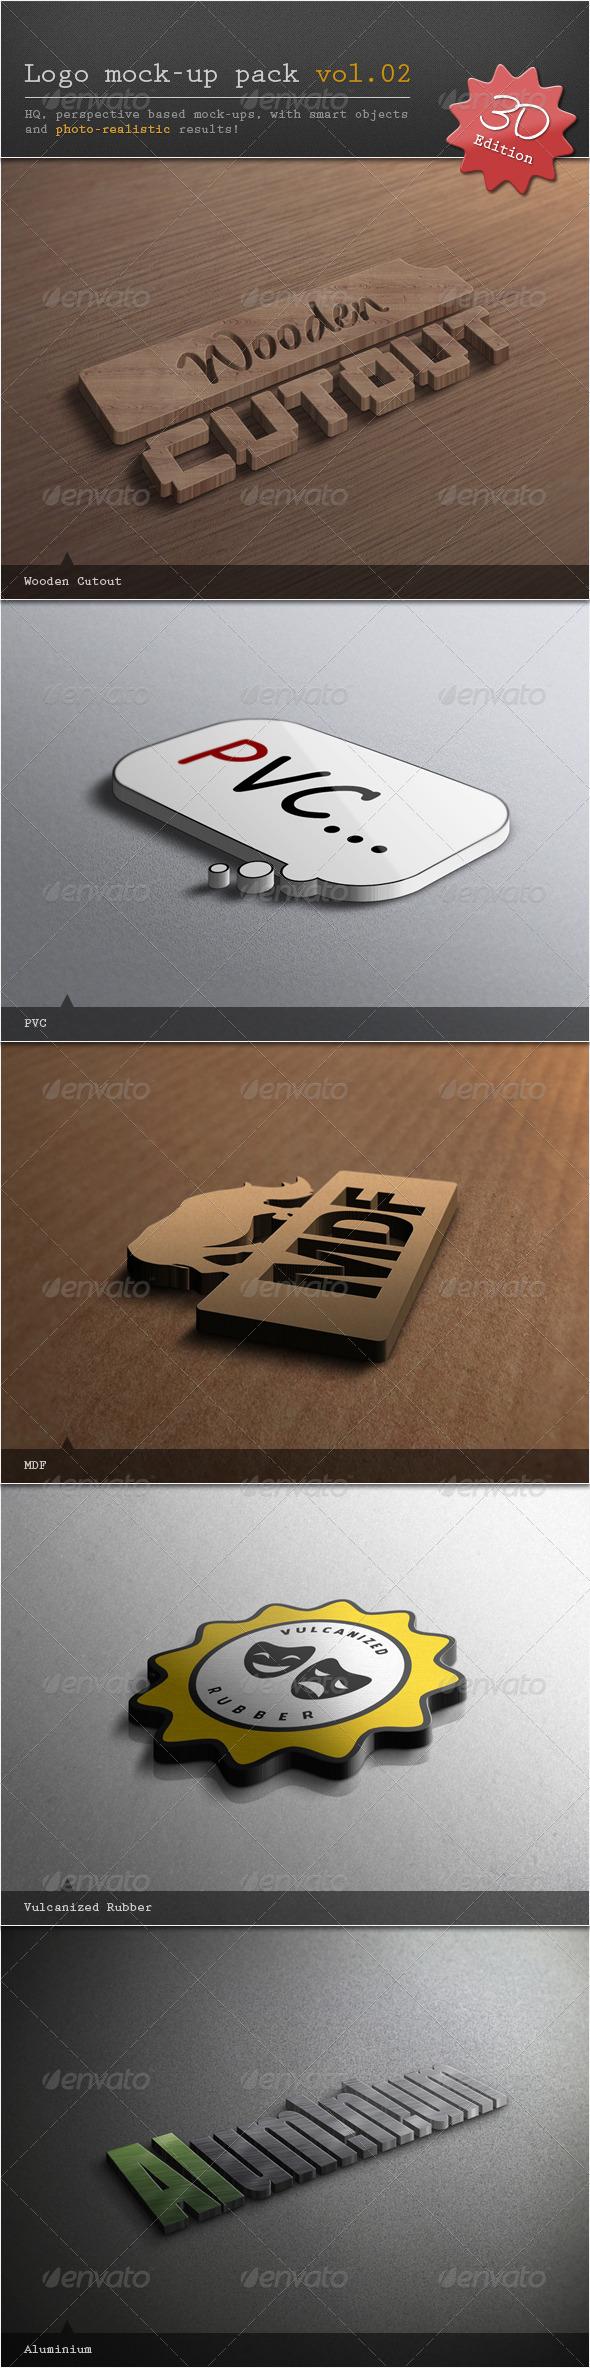 Logo Mock-up Pack Vol.02 / 3D Edition - Logo Product Mock-Ups